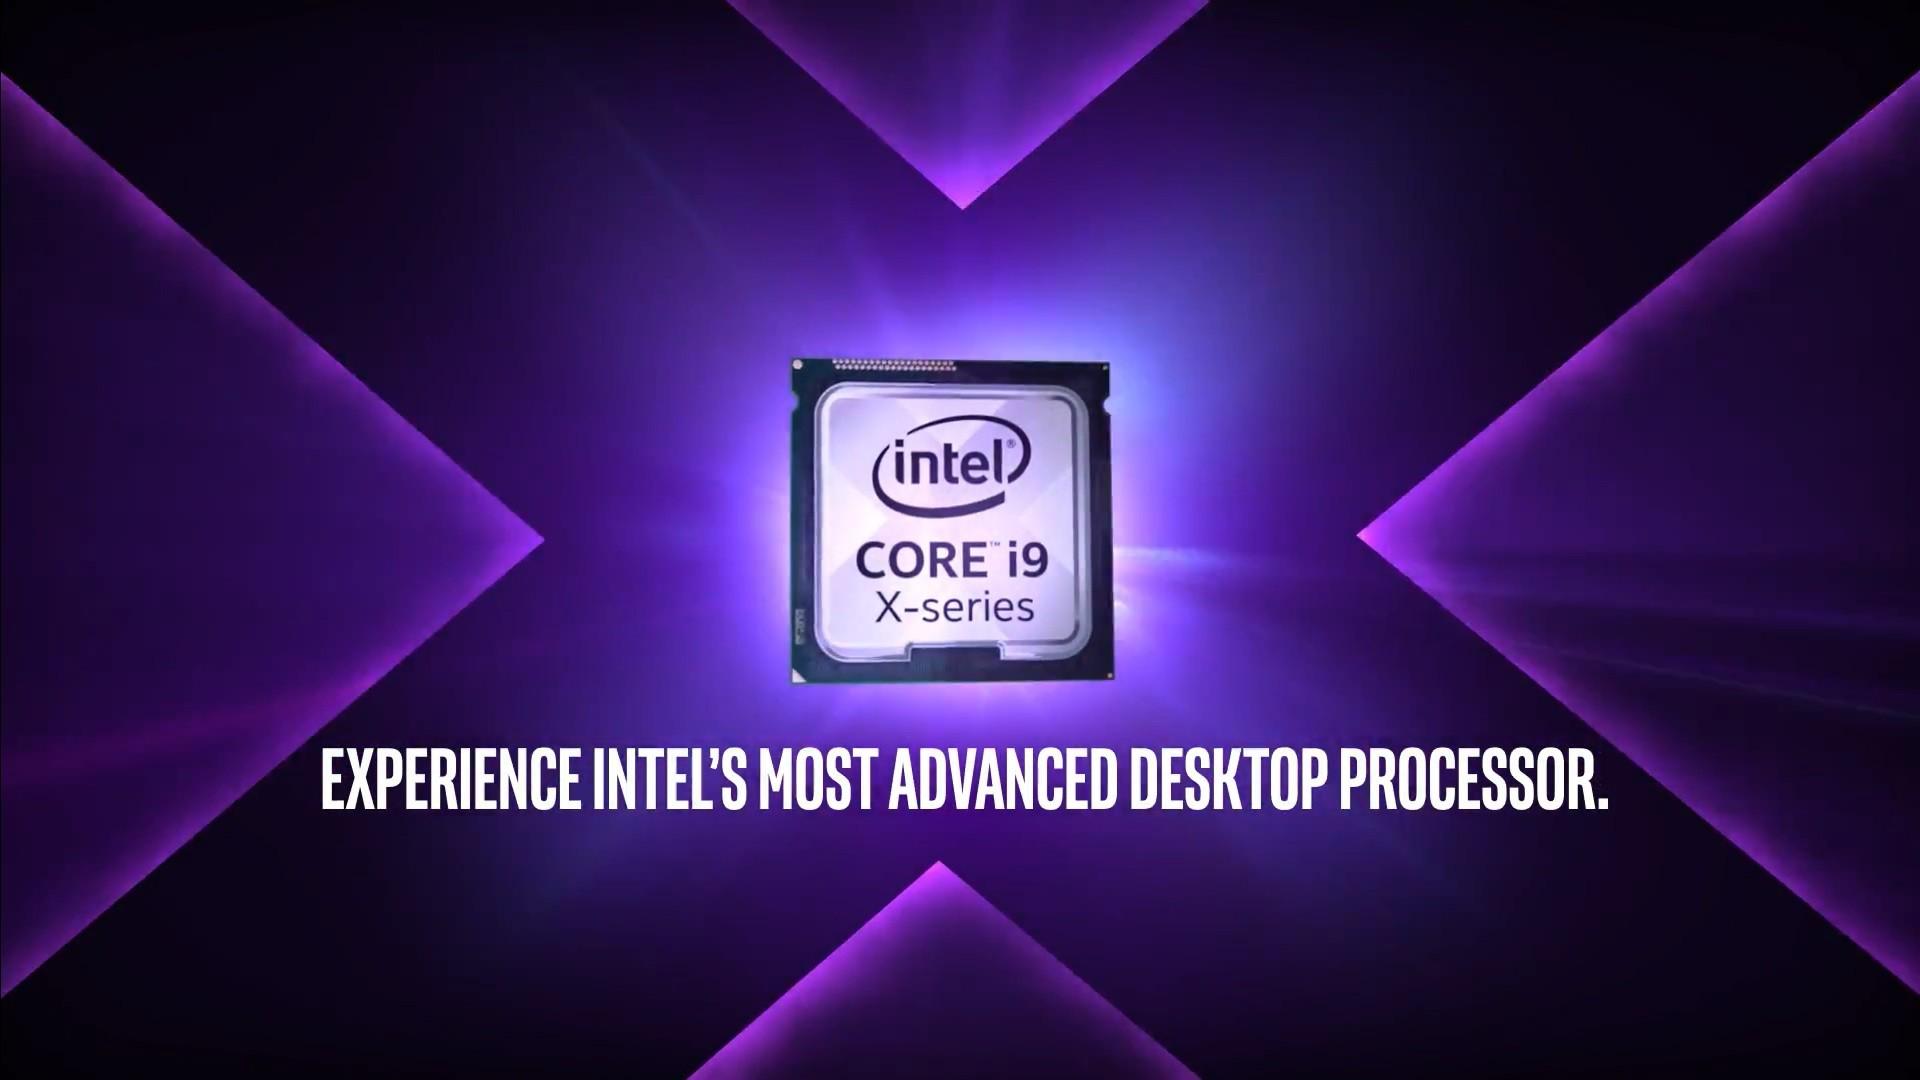 Intel Wallpaper 70 Images